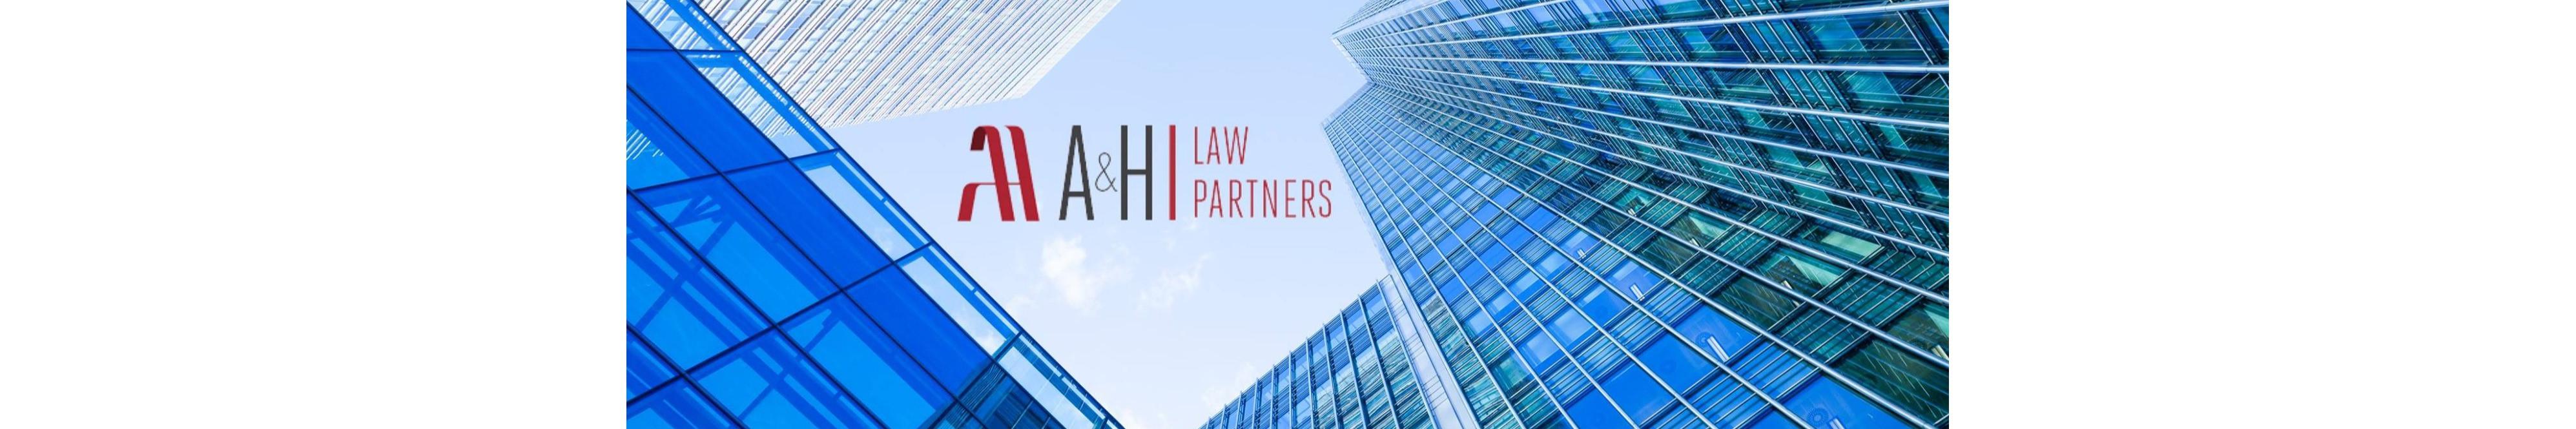 A&H Law Partners – юридическая фирма в Испании